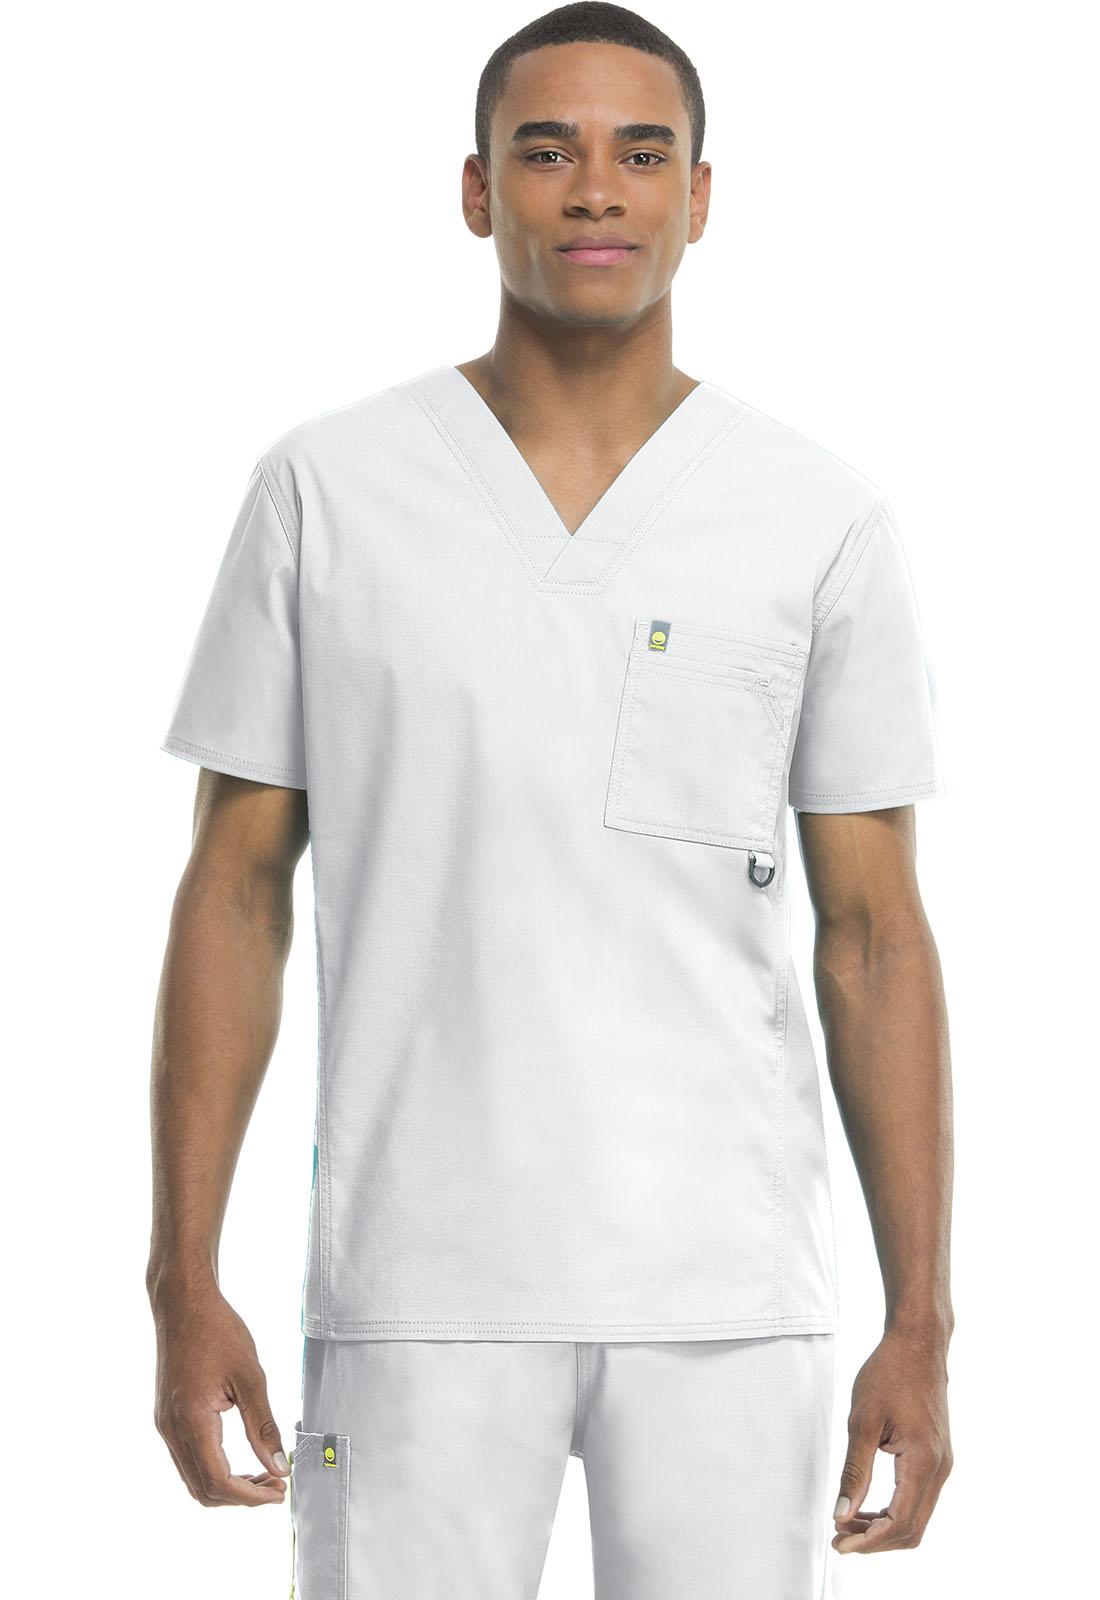 cc85d51e969 Bliss Men's V-Neck Top in White 16600A-WHCH from Cherokee Scrubs and ...